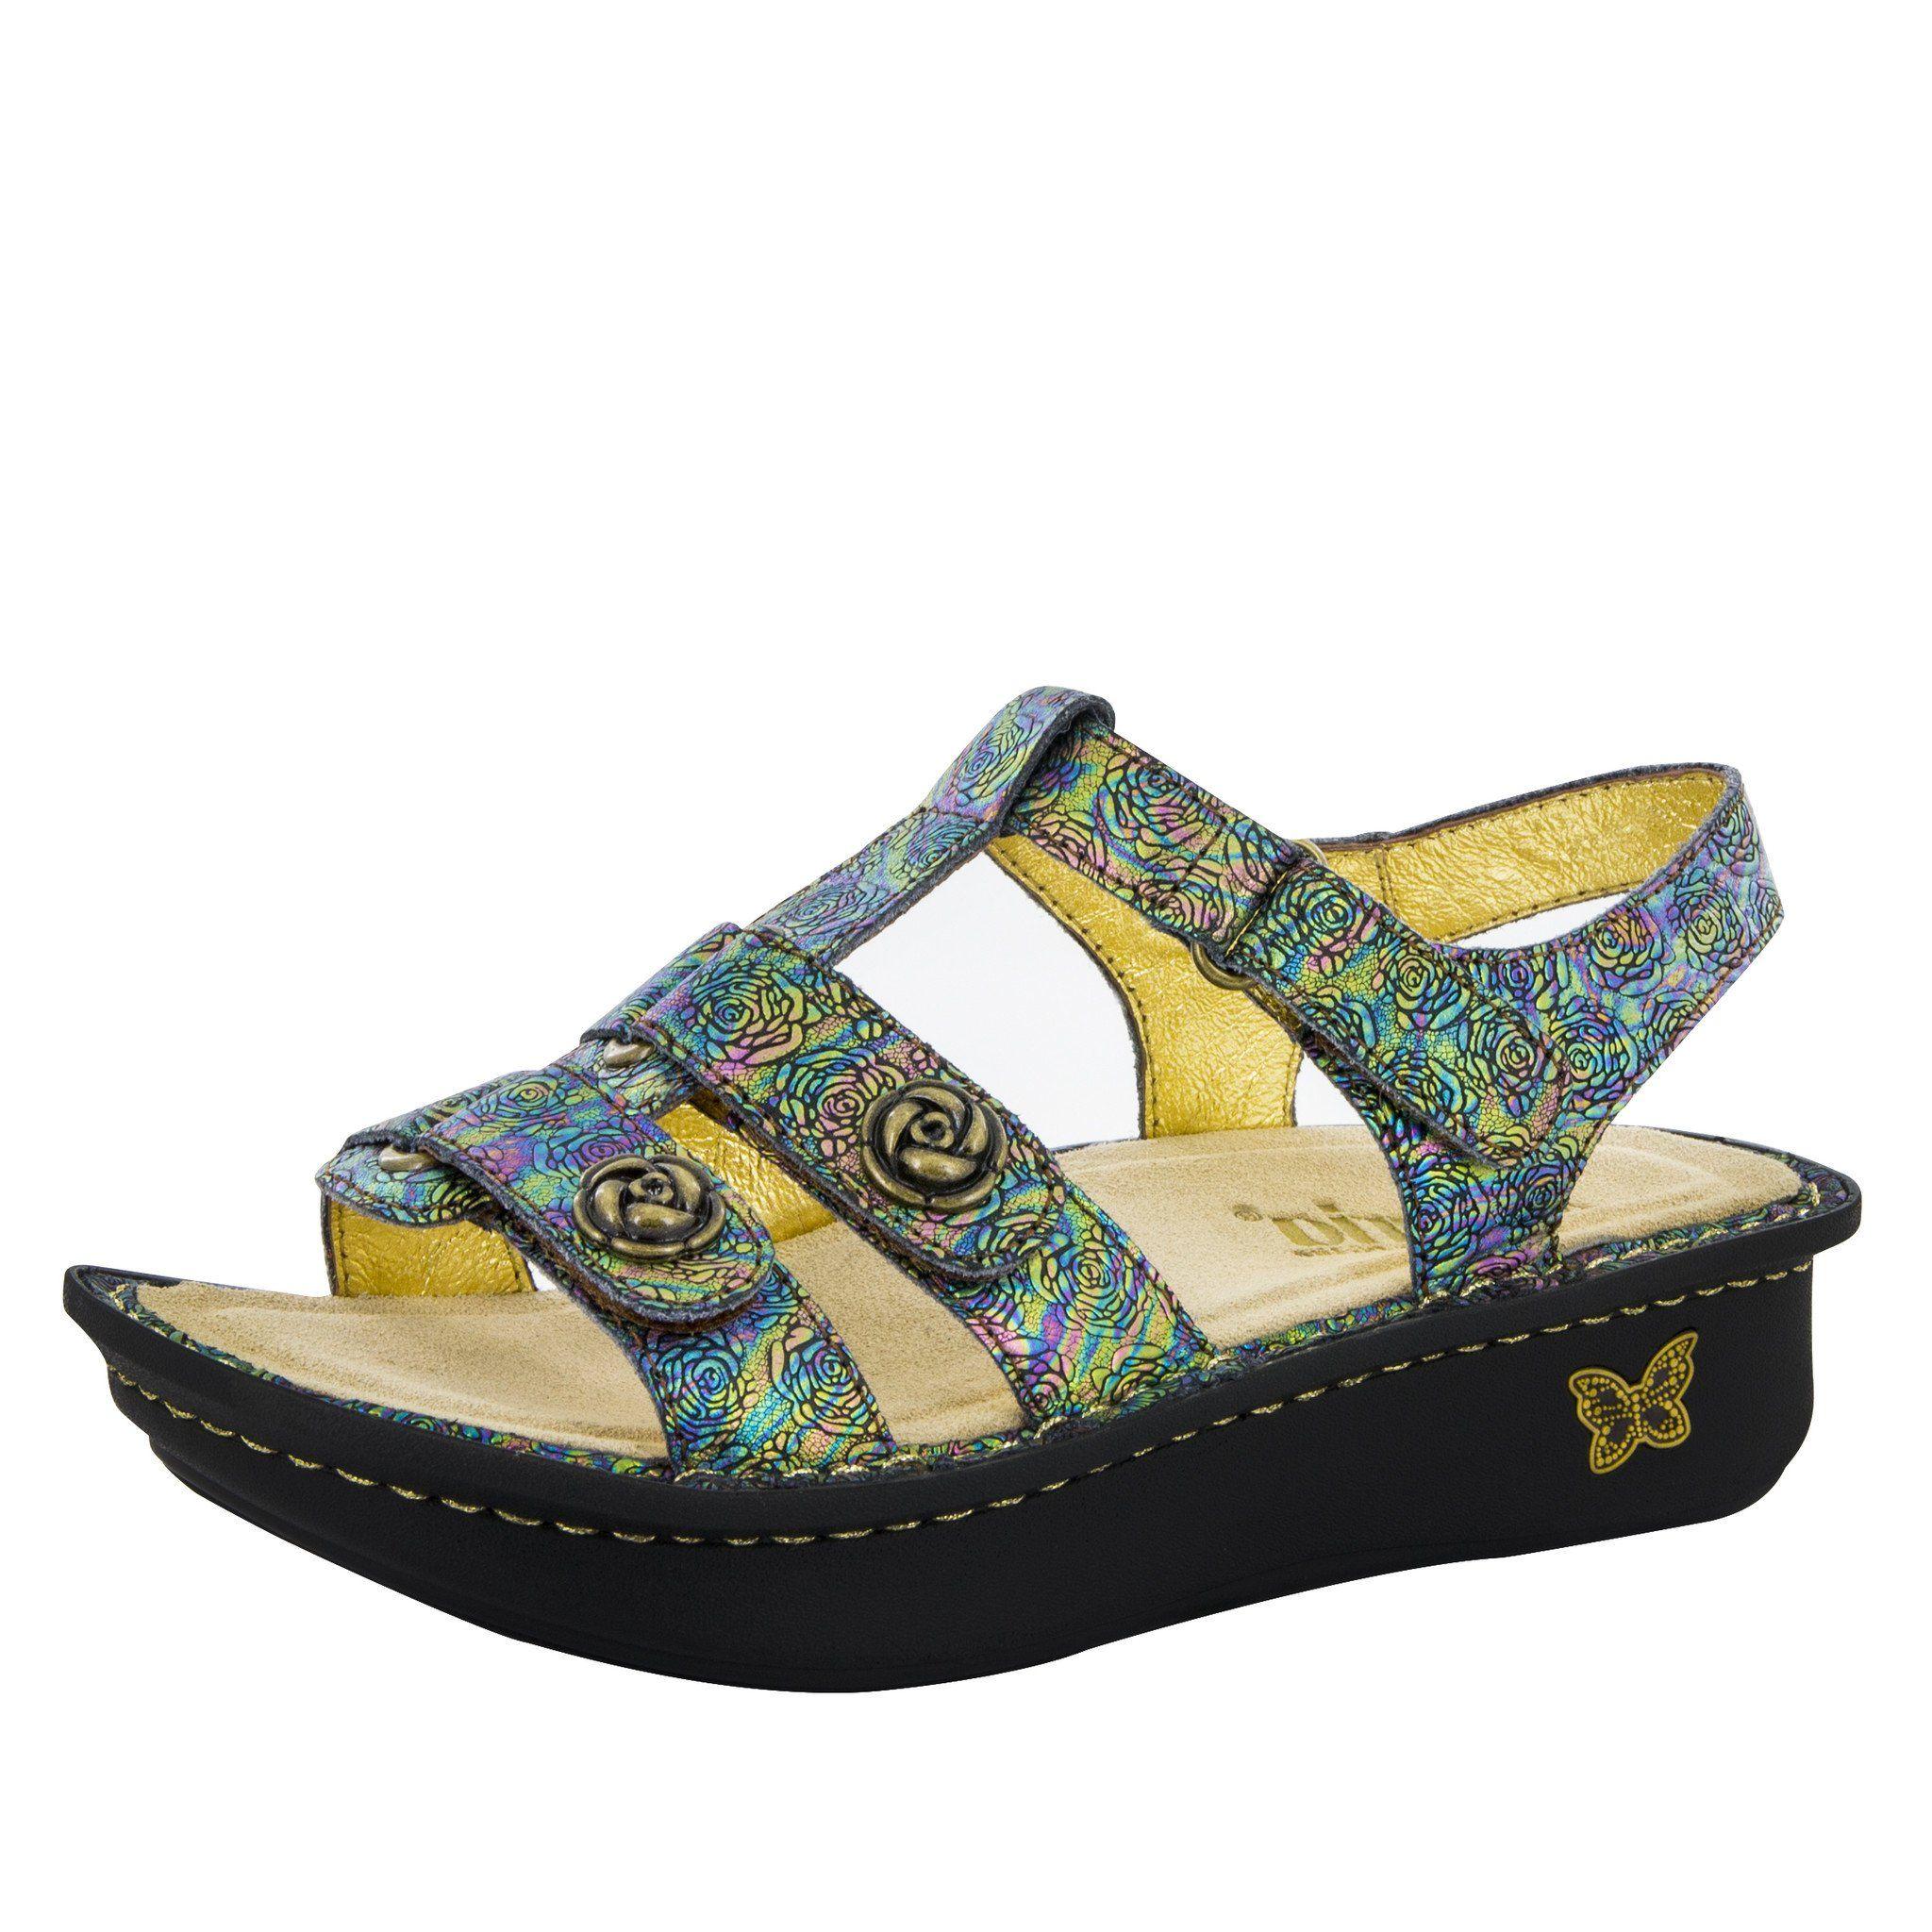 83e4196c438 Kleo Abalone Rose Sandal – Alegria Shoes